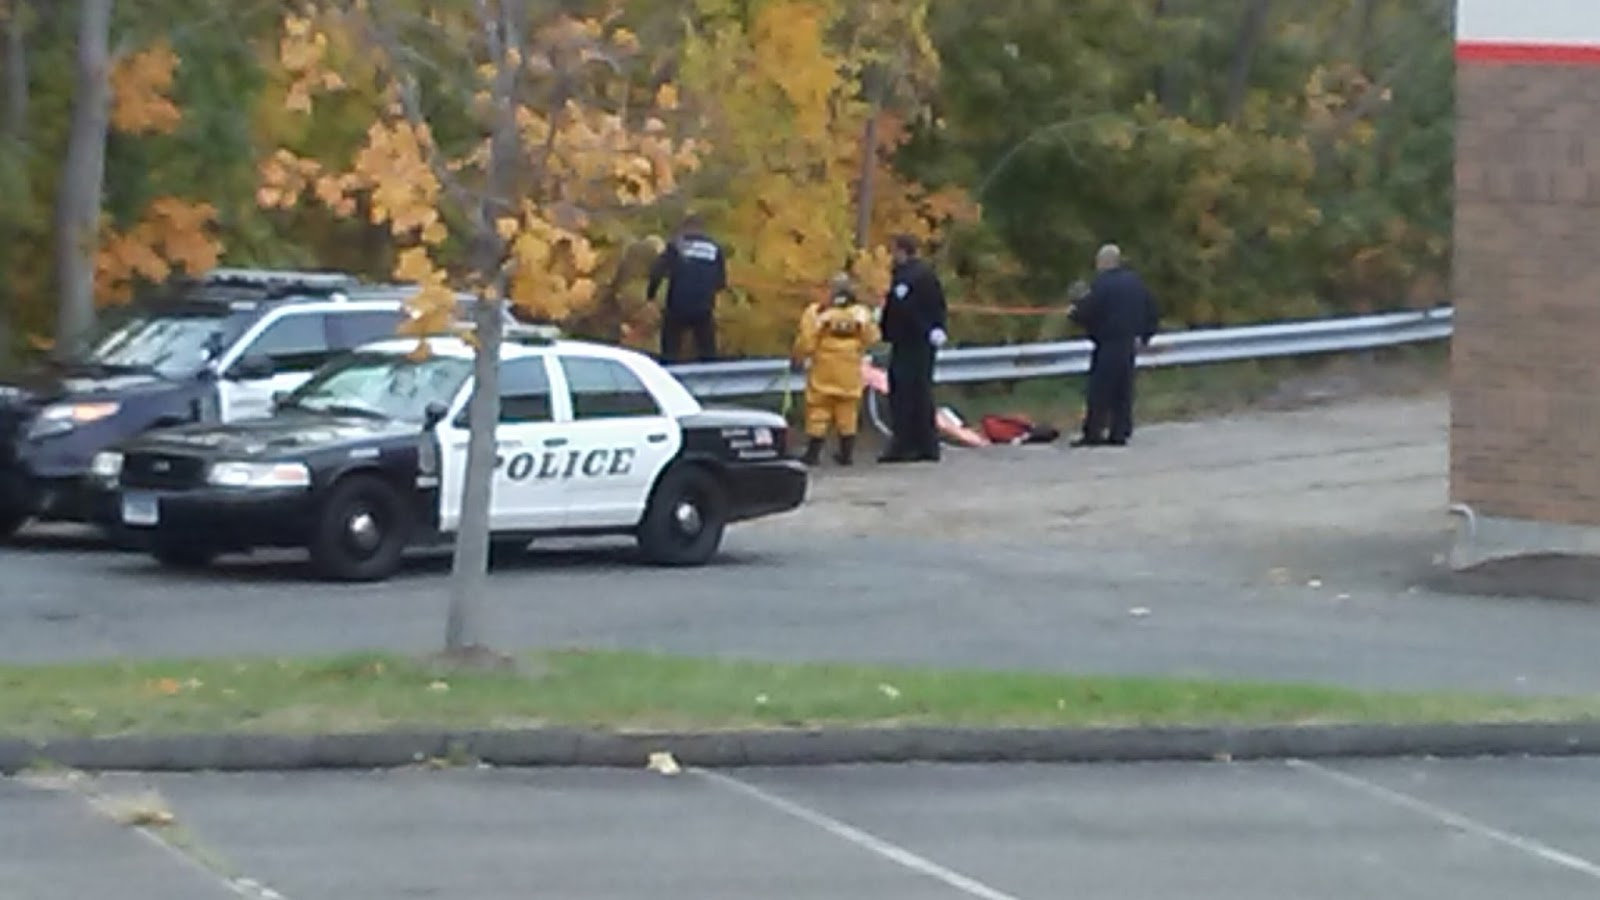 The Middletown Insider: Middletown Man Taken into Custody After ...